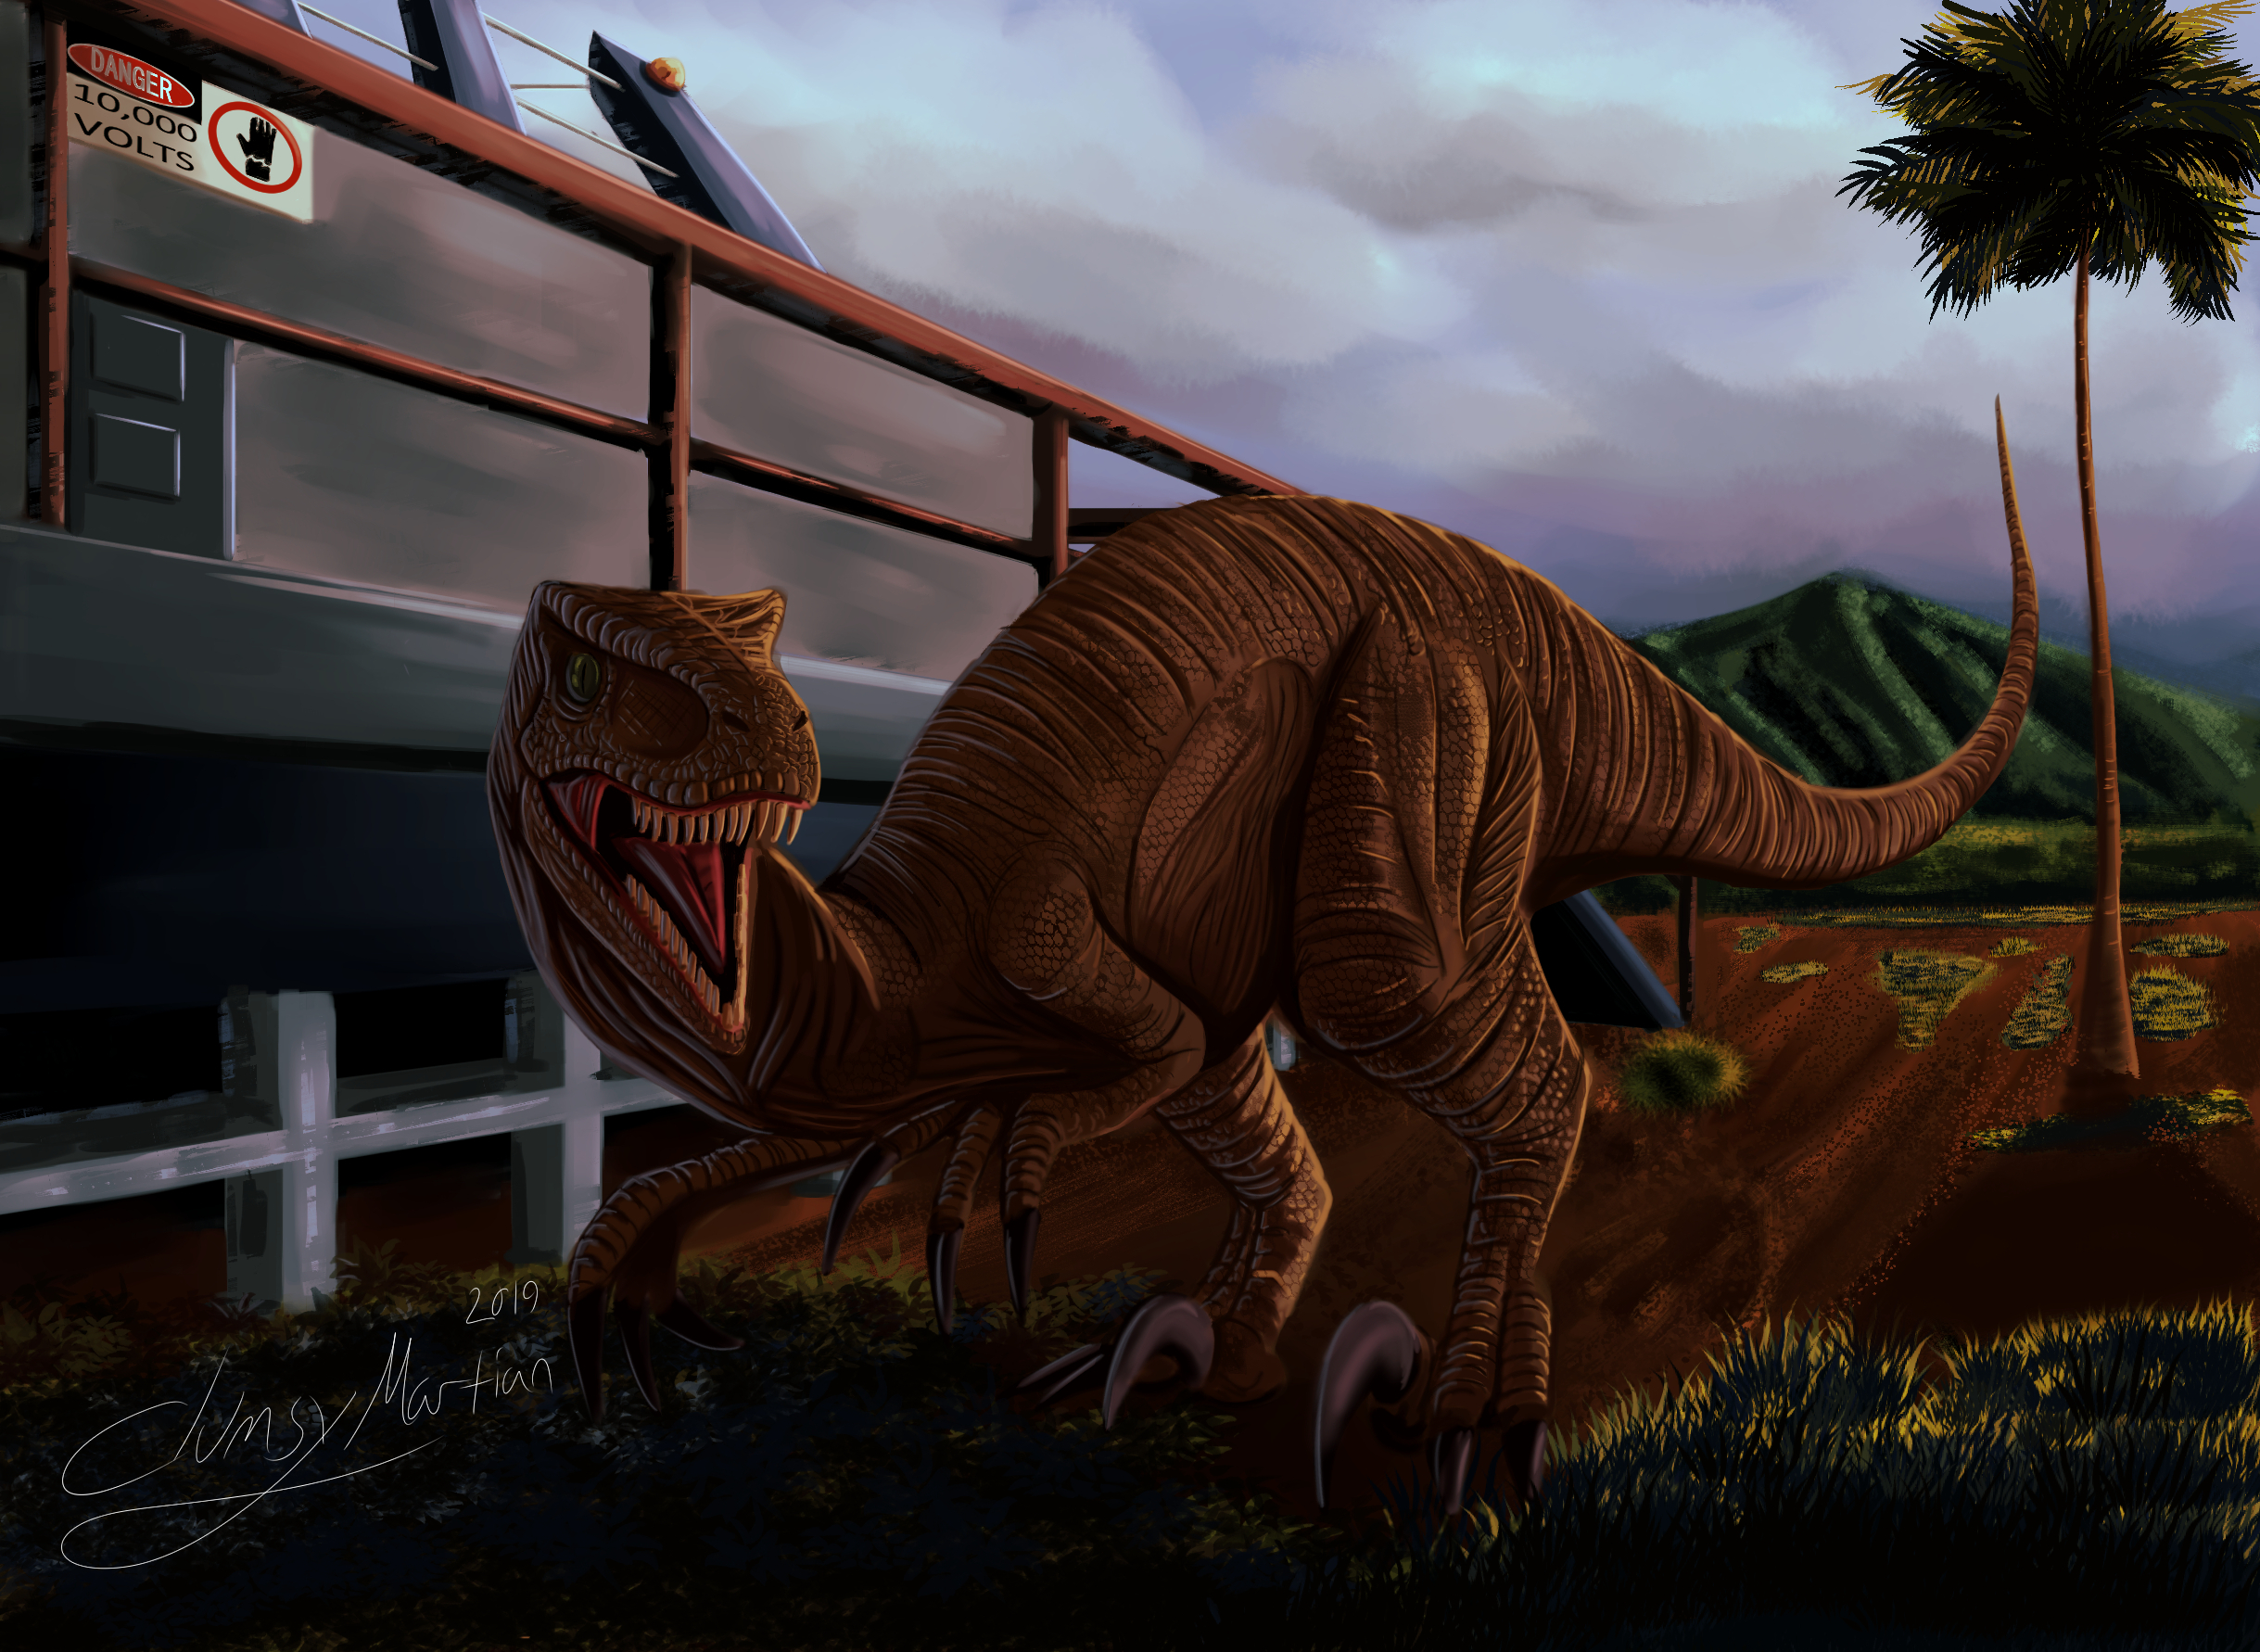 Velociraptor from Jurassic Park